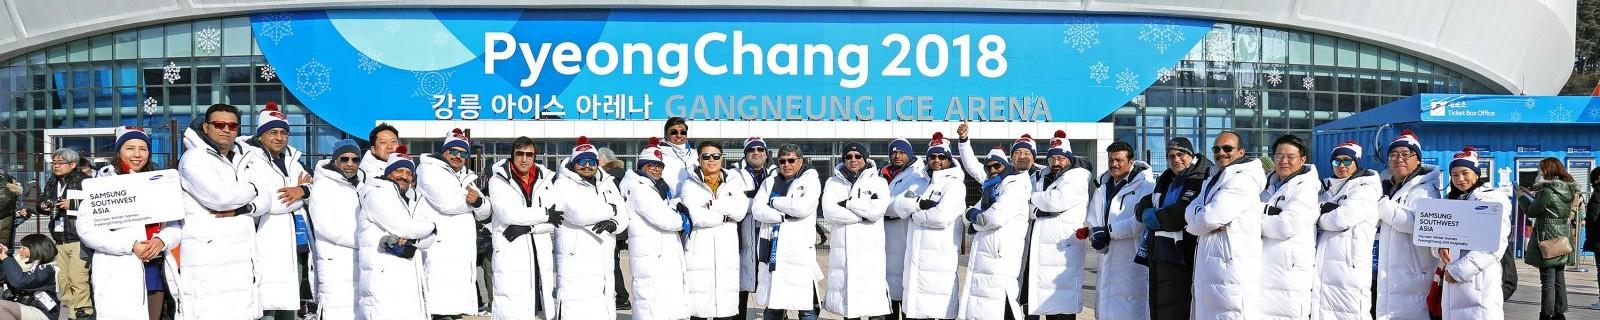 HOSPITALITY PROGRAM: PYEONGCHANG OLYMPIC 2018